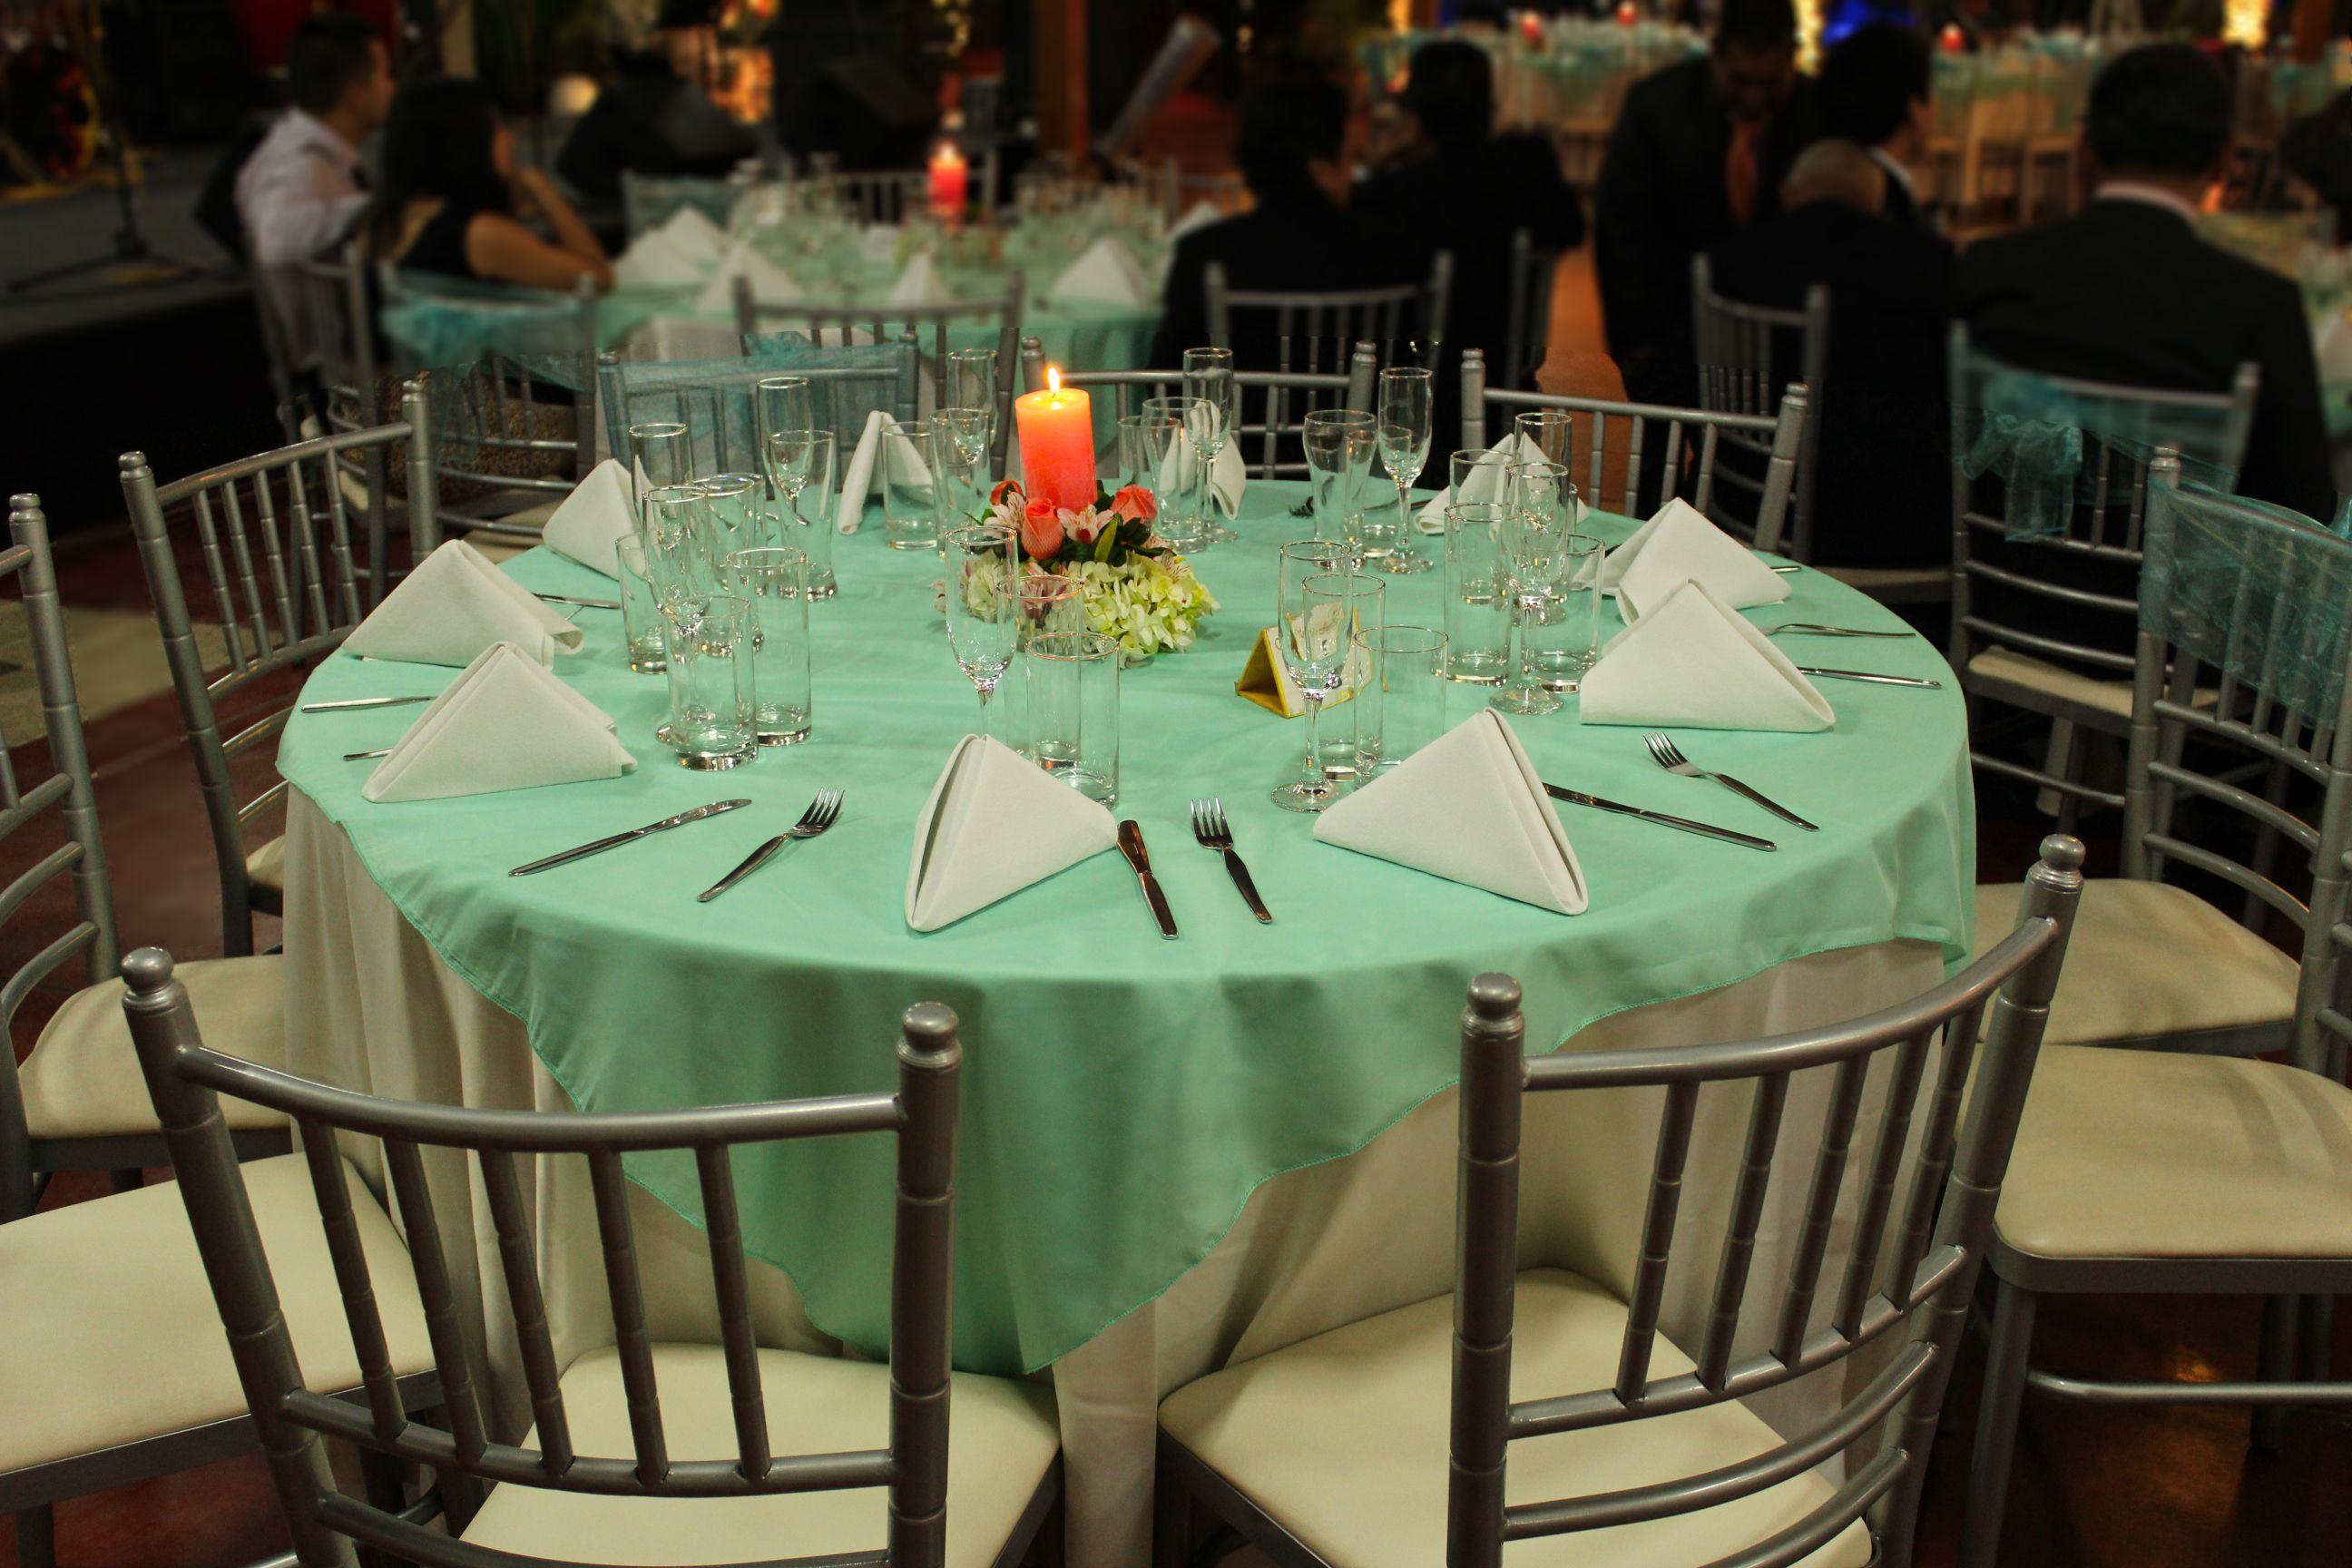 Bella mesa redonda vestida con tela color agua marina y sillas estilo tiffany boda salon - Mesa redonda con sillas ...